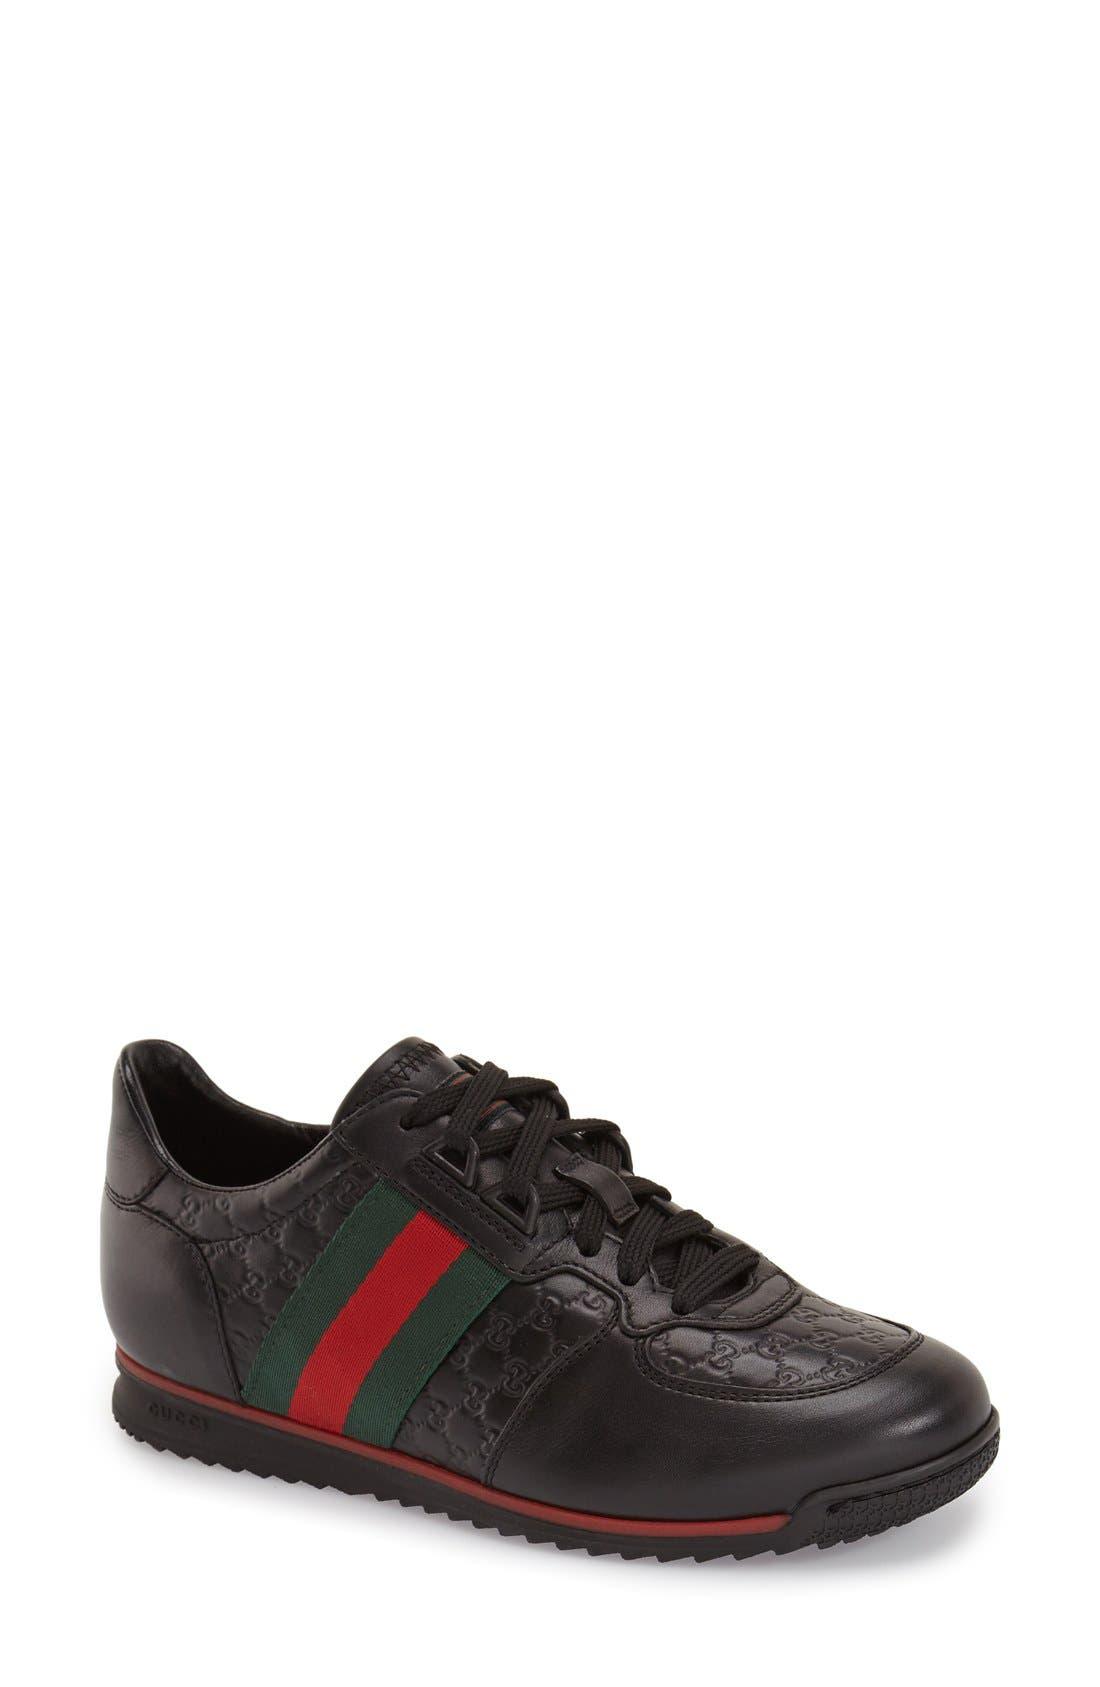 Alternate Image 1 Selected - Gucci 'SL73' Sneaker (Women)